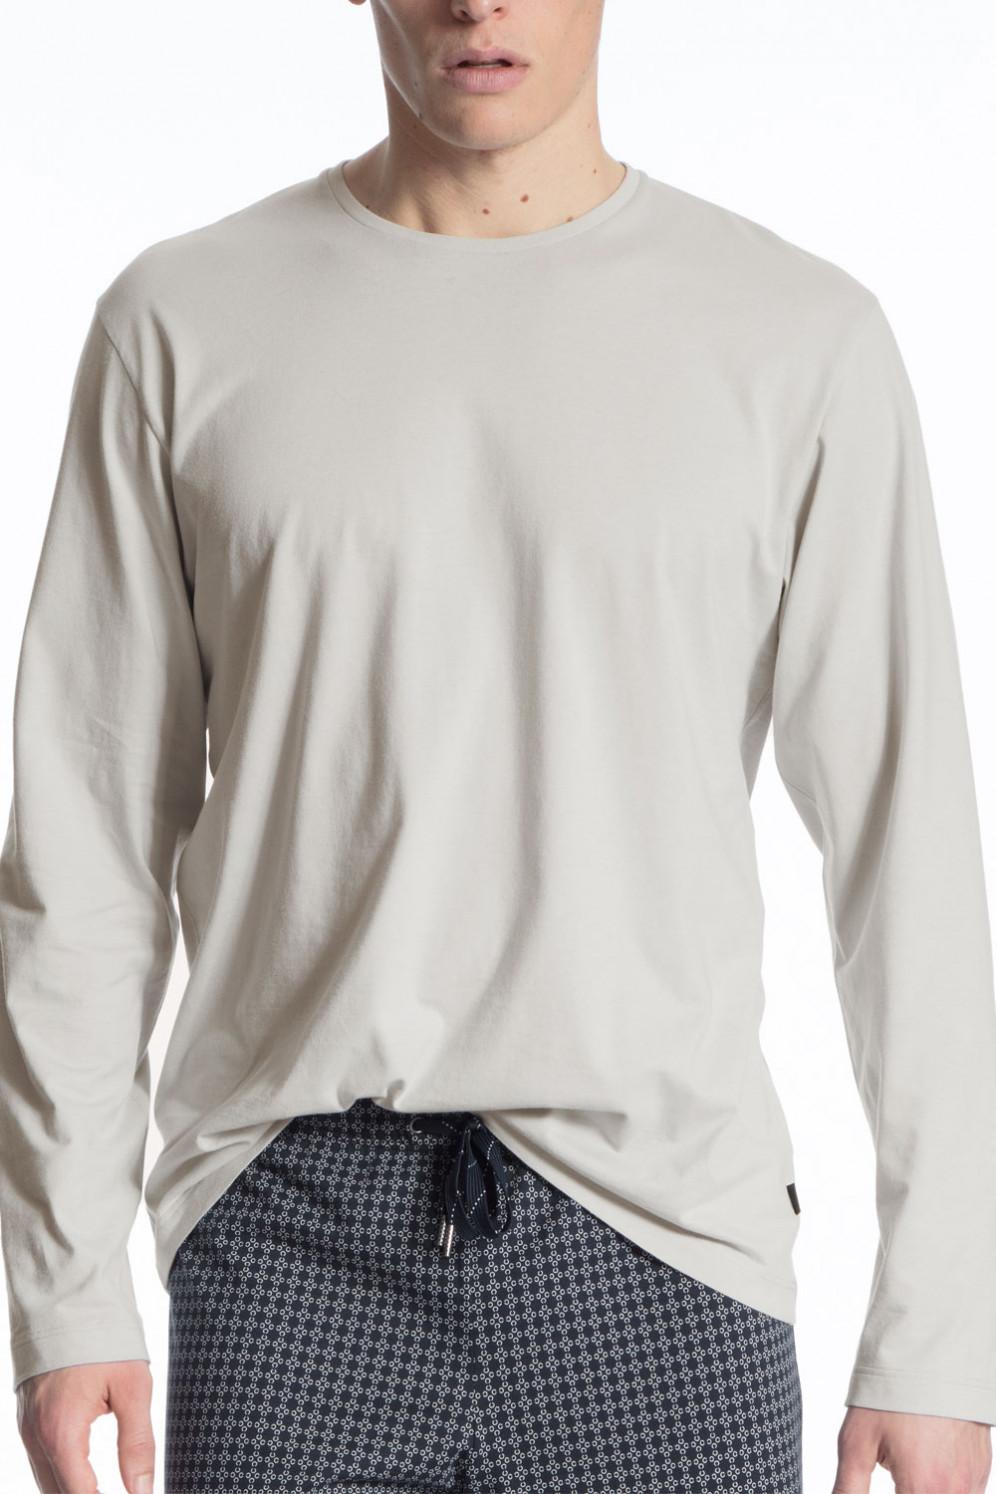 3178ed7f4766de Vergrößern Abbildung zu Shirt langarm (15081) der Marke Calida aus der  Serie Remix Basic ...